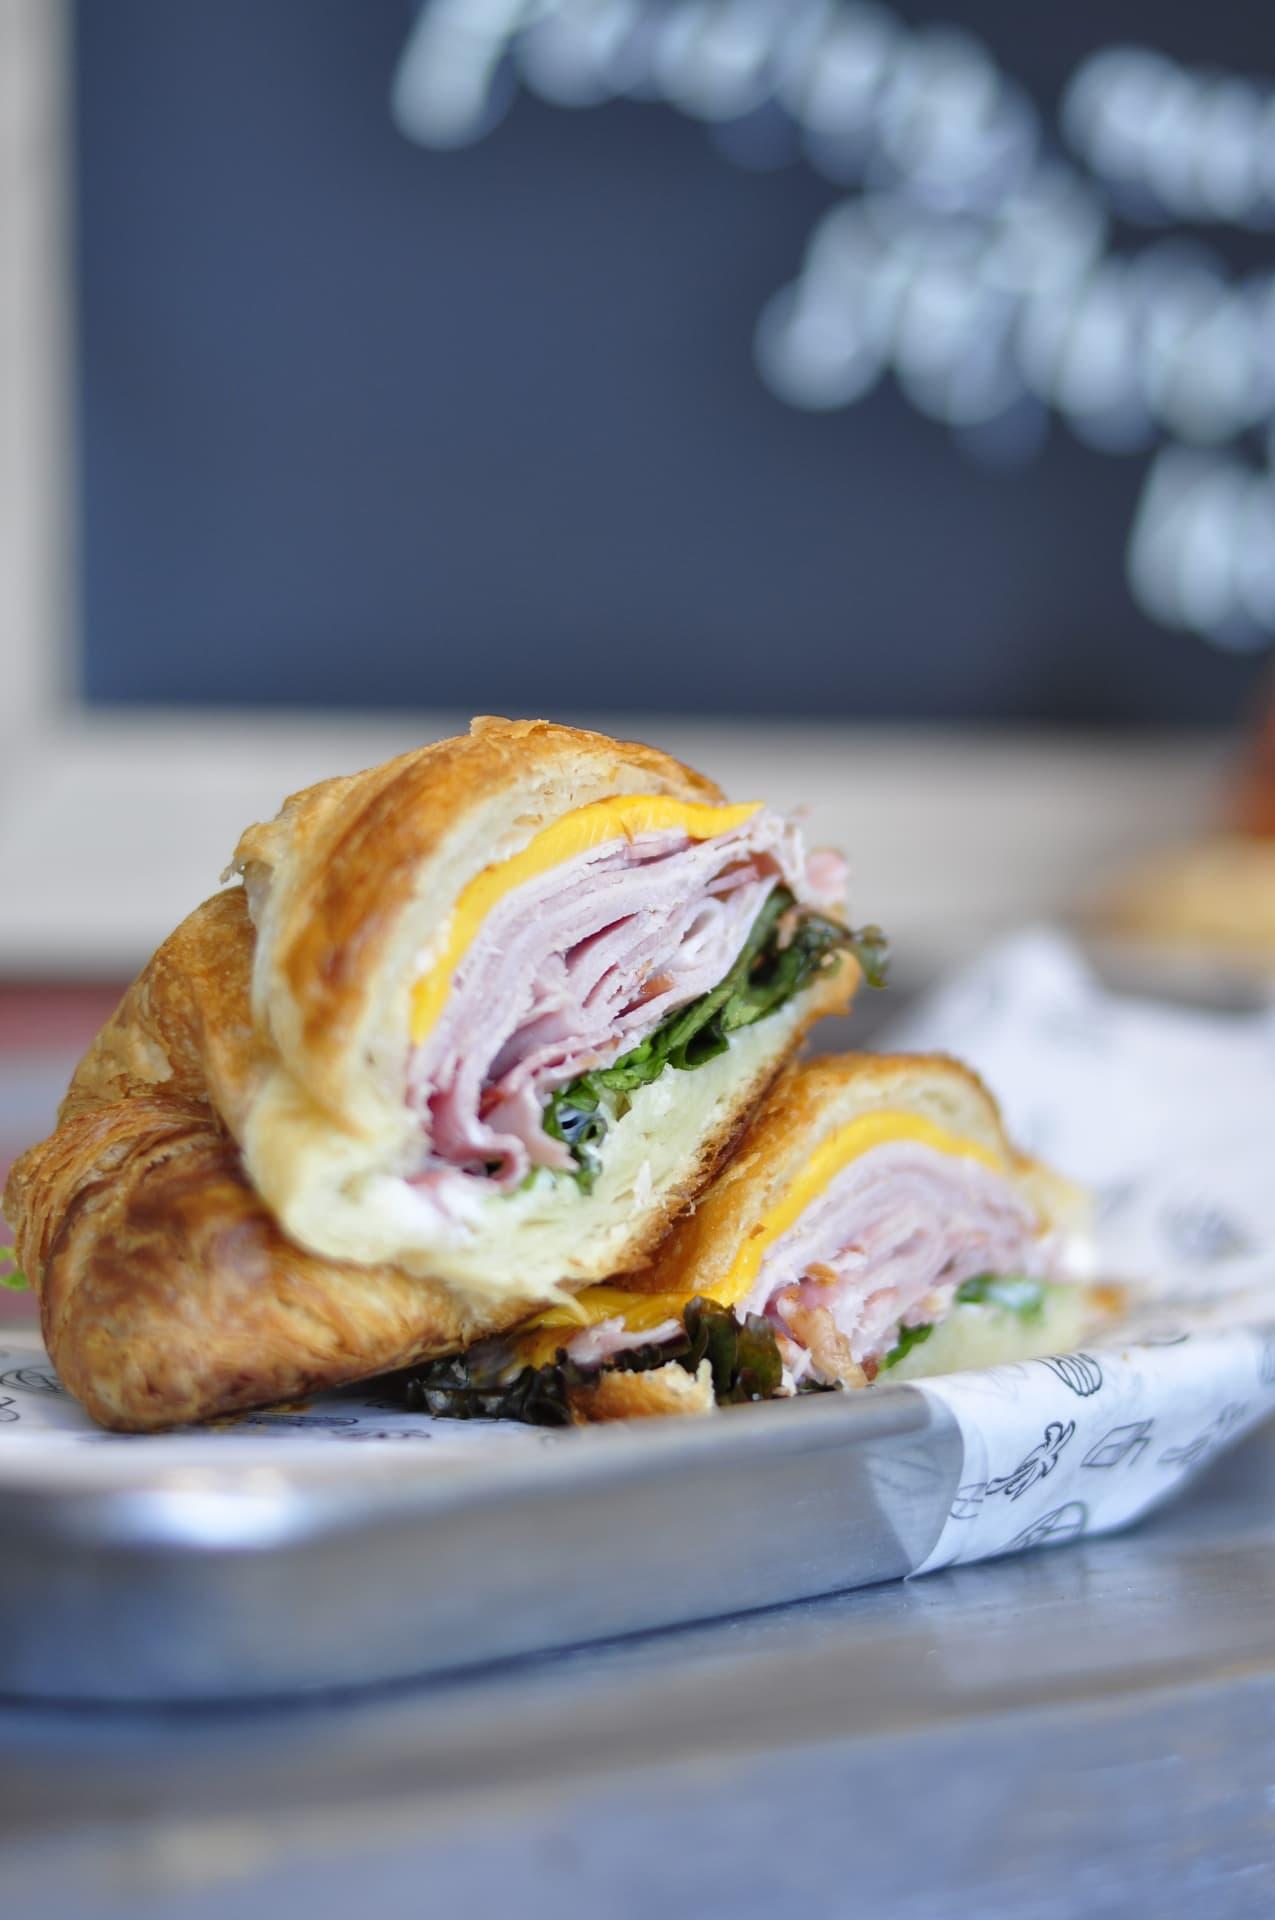 Turkey or Ham & Cheese